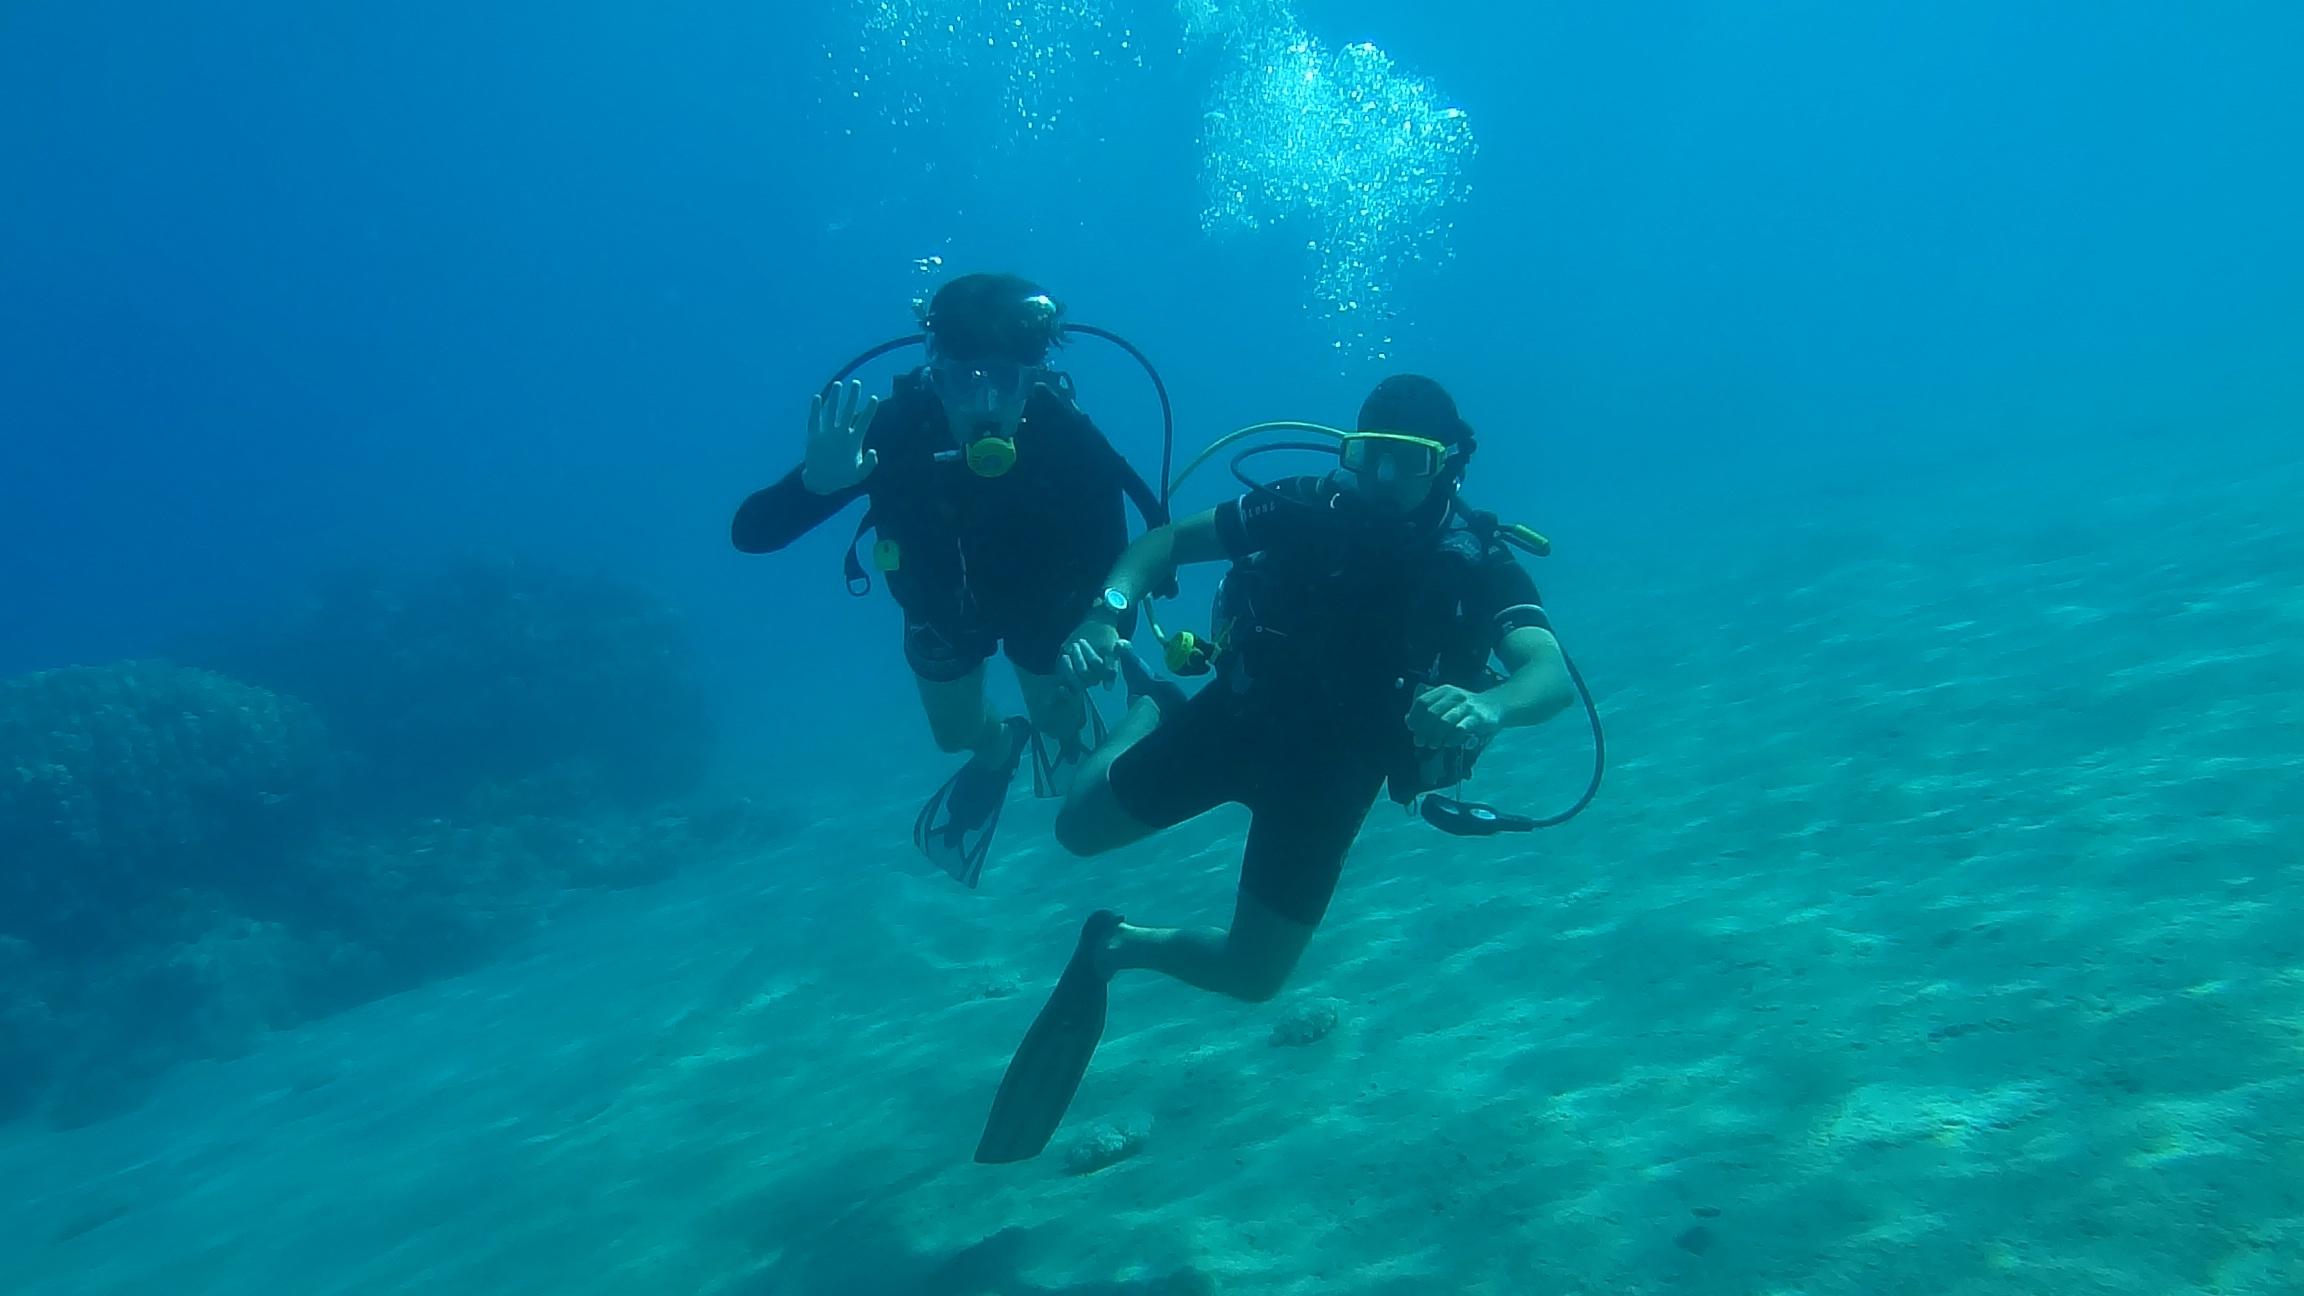 Free images sea ocean summer blue fish swimming - Dive deep blue ...